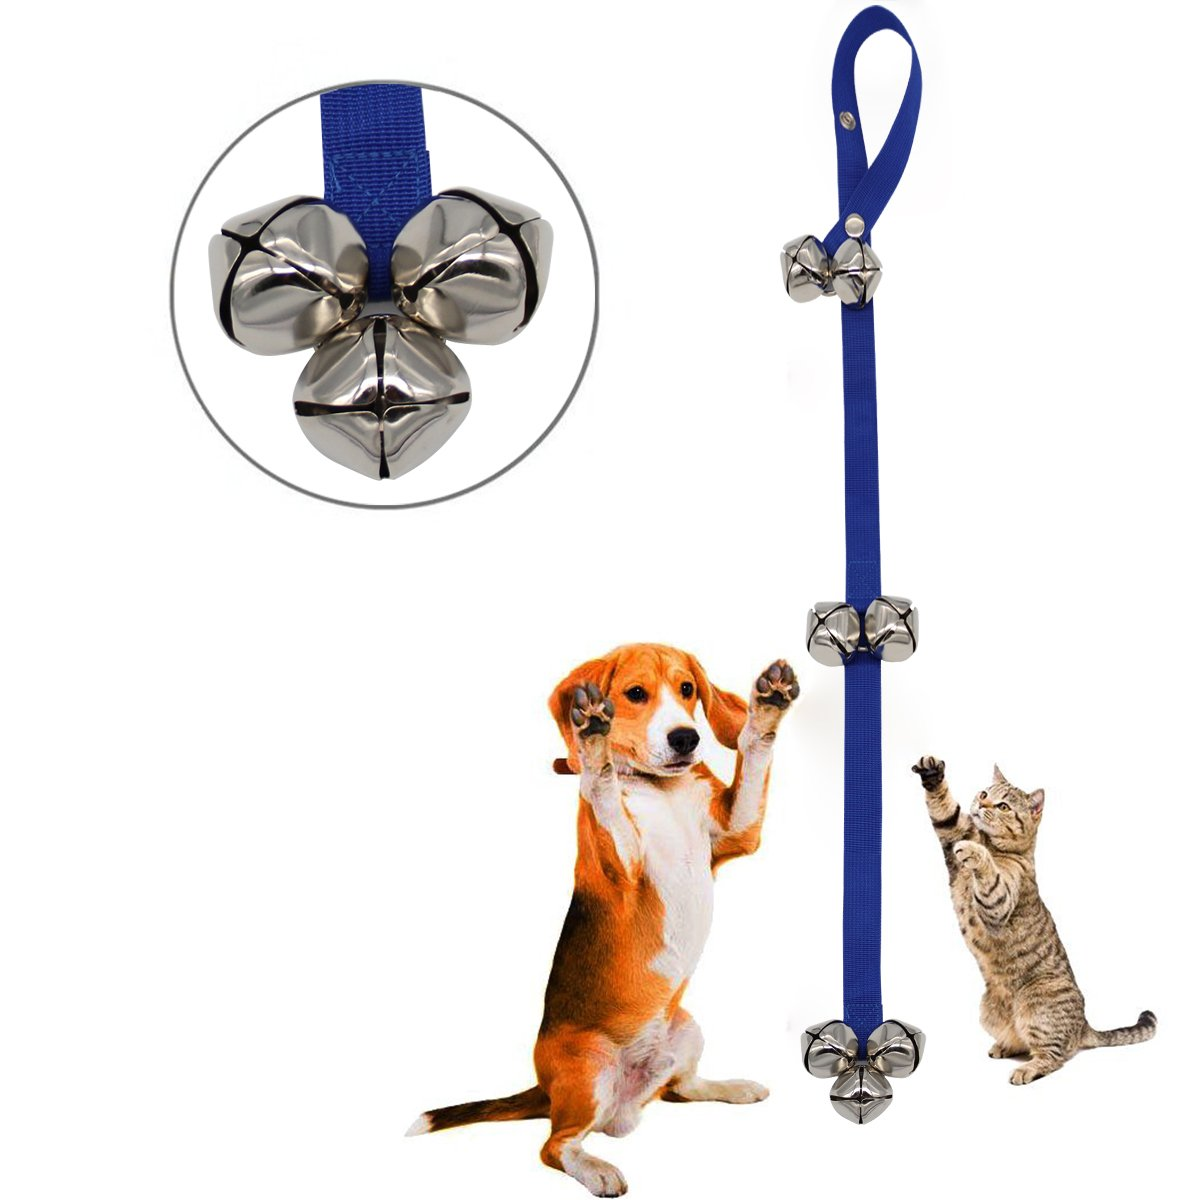 Pet Doorbells Premium Quality Training Potty, Knocking door, Calling, Dog Cat Bells Adjustable Door Bell, for Potty Training, Easy Train, 7 Bells Upgrade ver, by Yamissi (Blue)